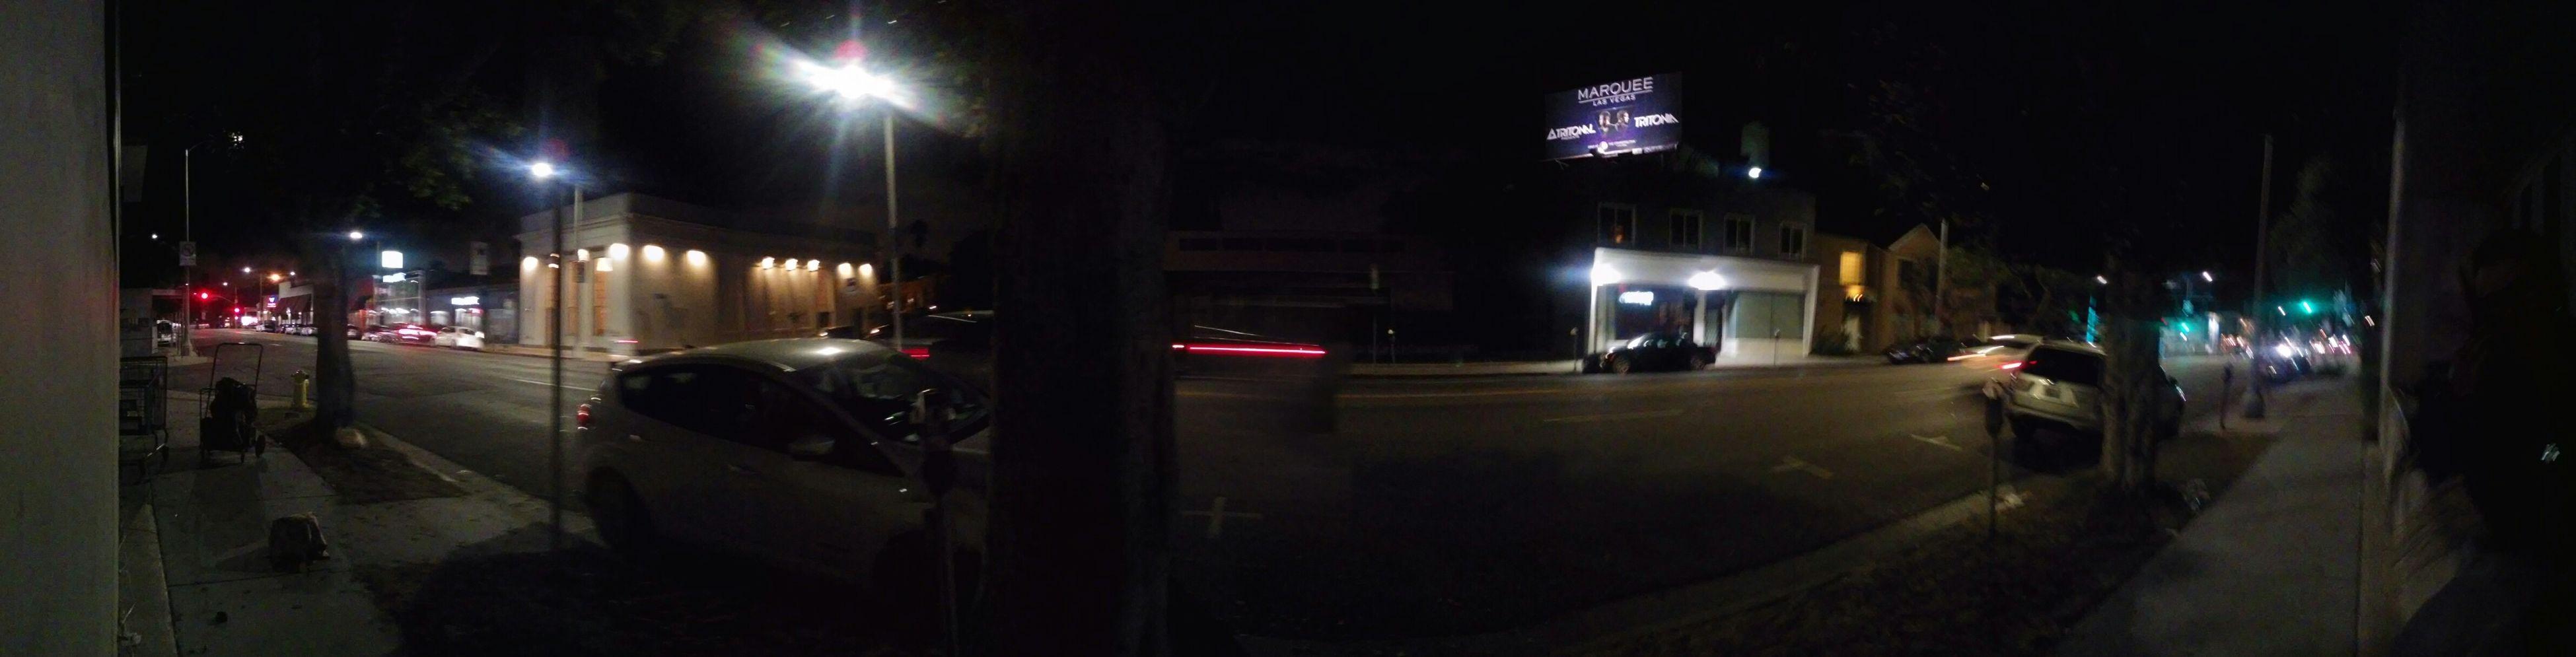 night, illuminated, transportation, land vehicle, car, street, street light, mode of transport, building exterior, road, city, architecture, built structure, city street, lighting equipment, traffic, dark, city life, on the move, headlight